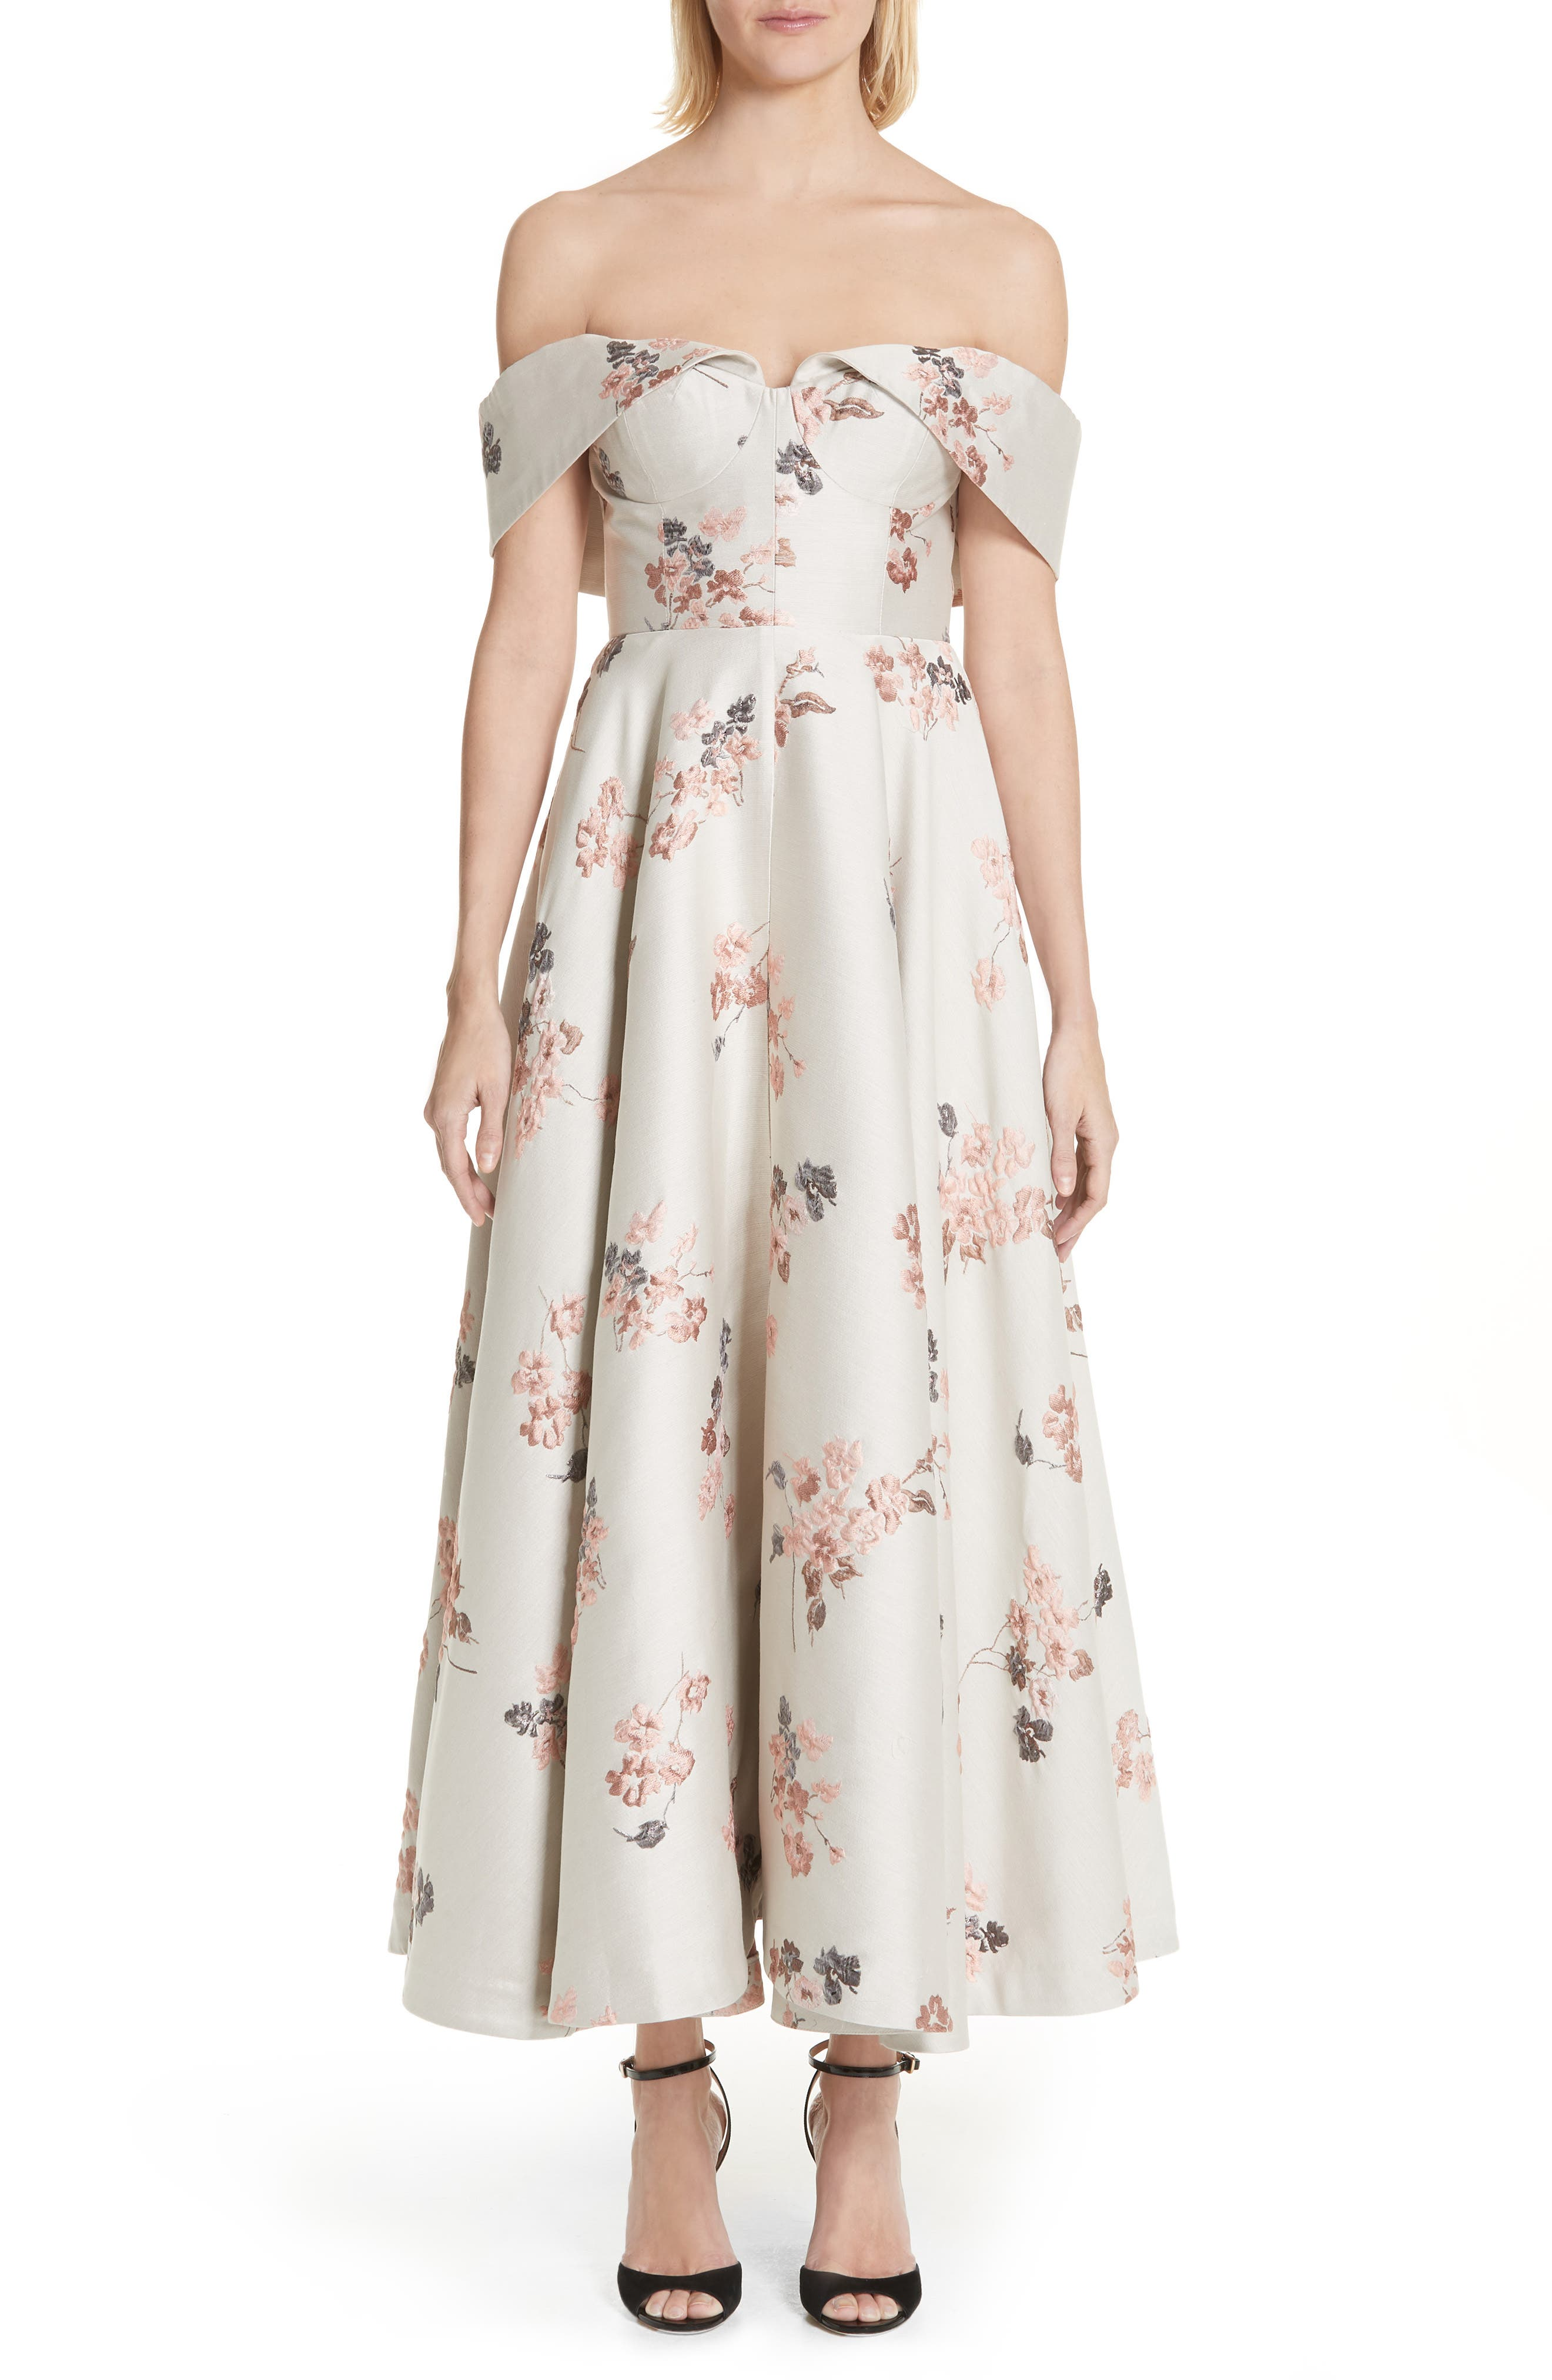 Metallic Floral Jacquard Off the Shoulder Dress,                             Main thumbnail 1, color,                             275